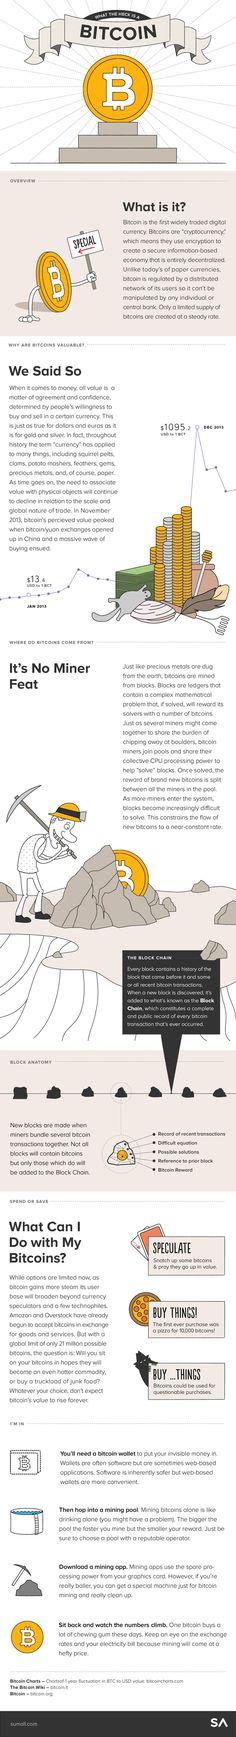 What the Heck Is a Bitcoin? #infographic #money #business {bitcoin earn|bitcoin mining|bitcoin trading!bitcoin platform}